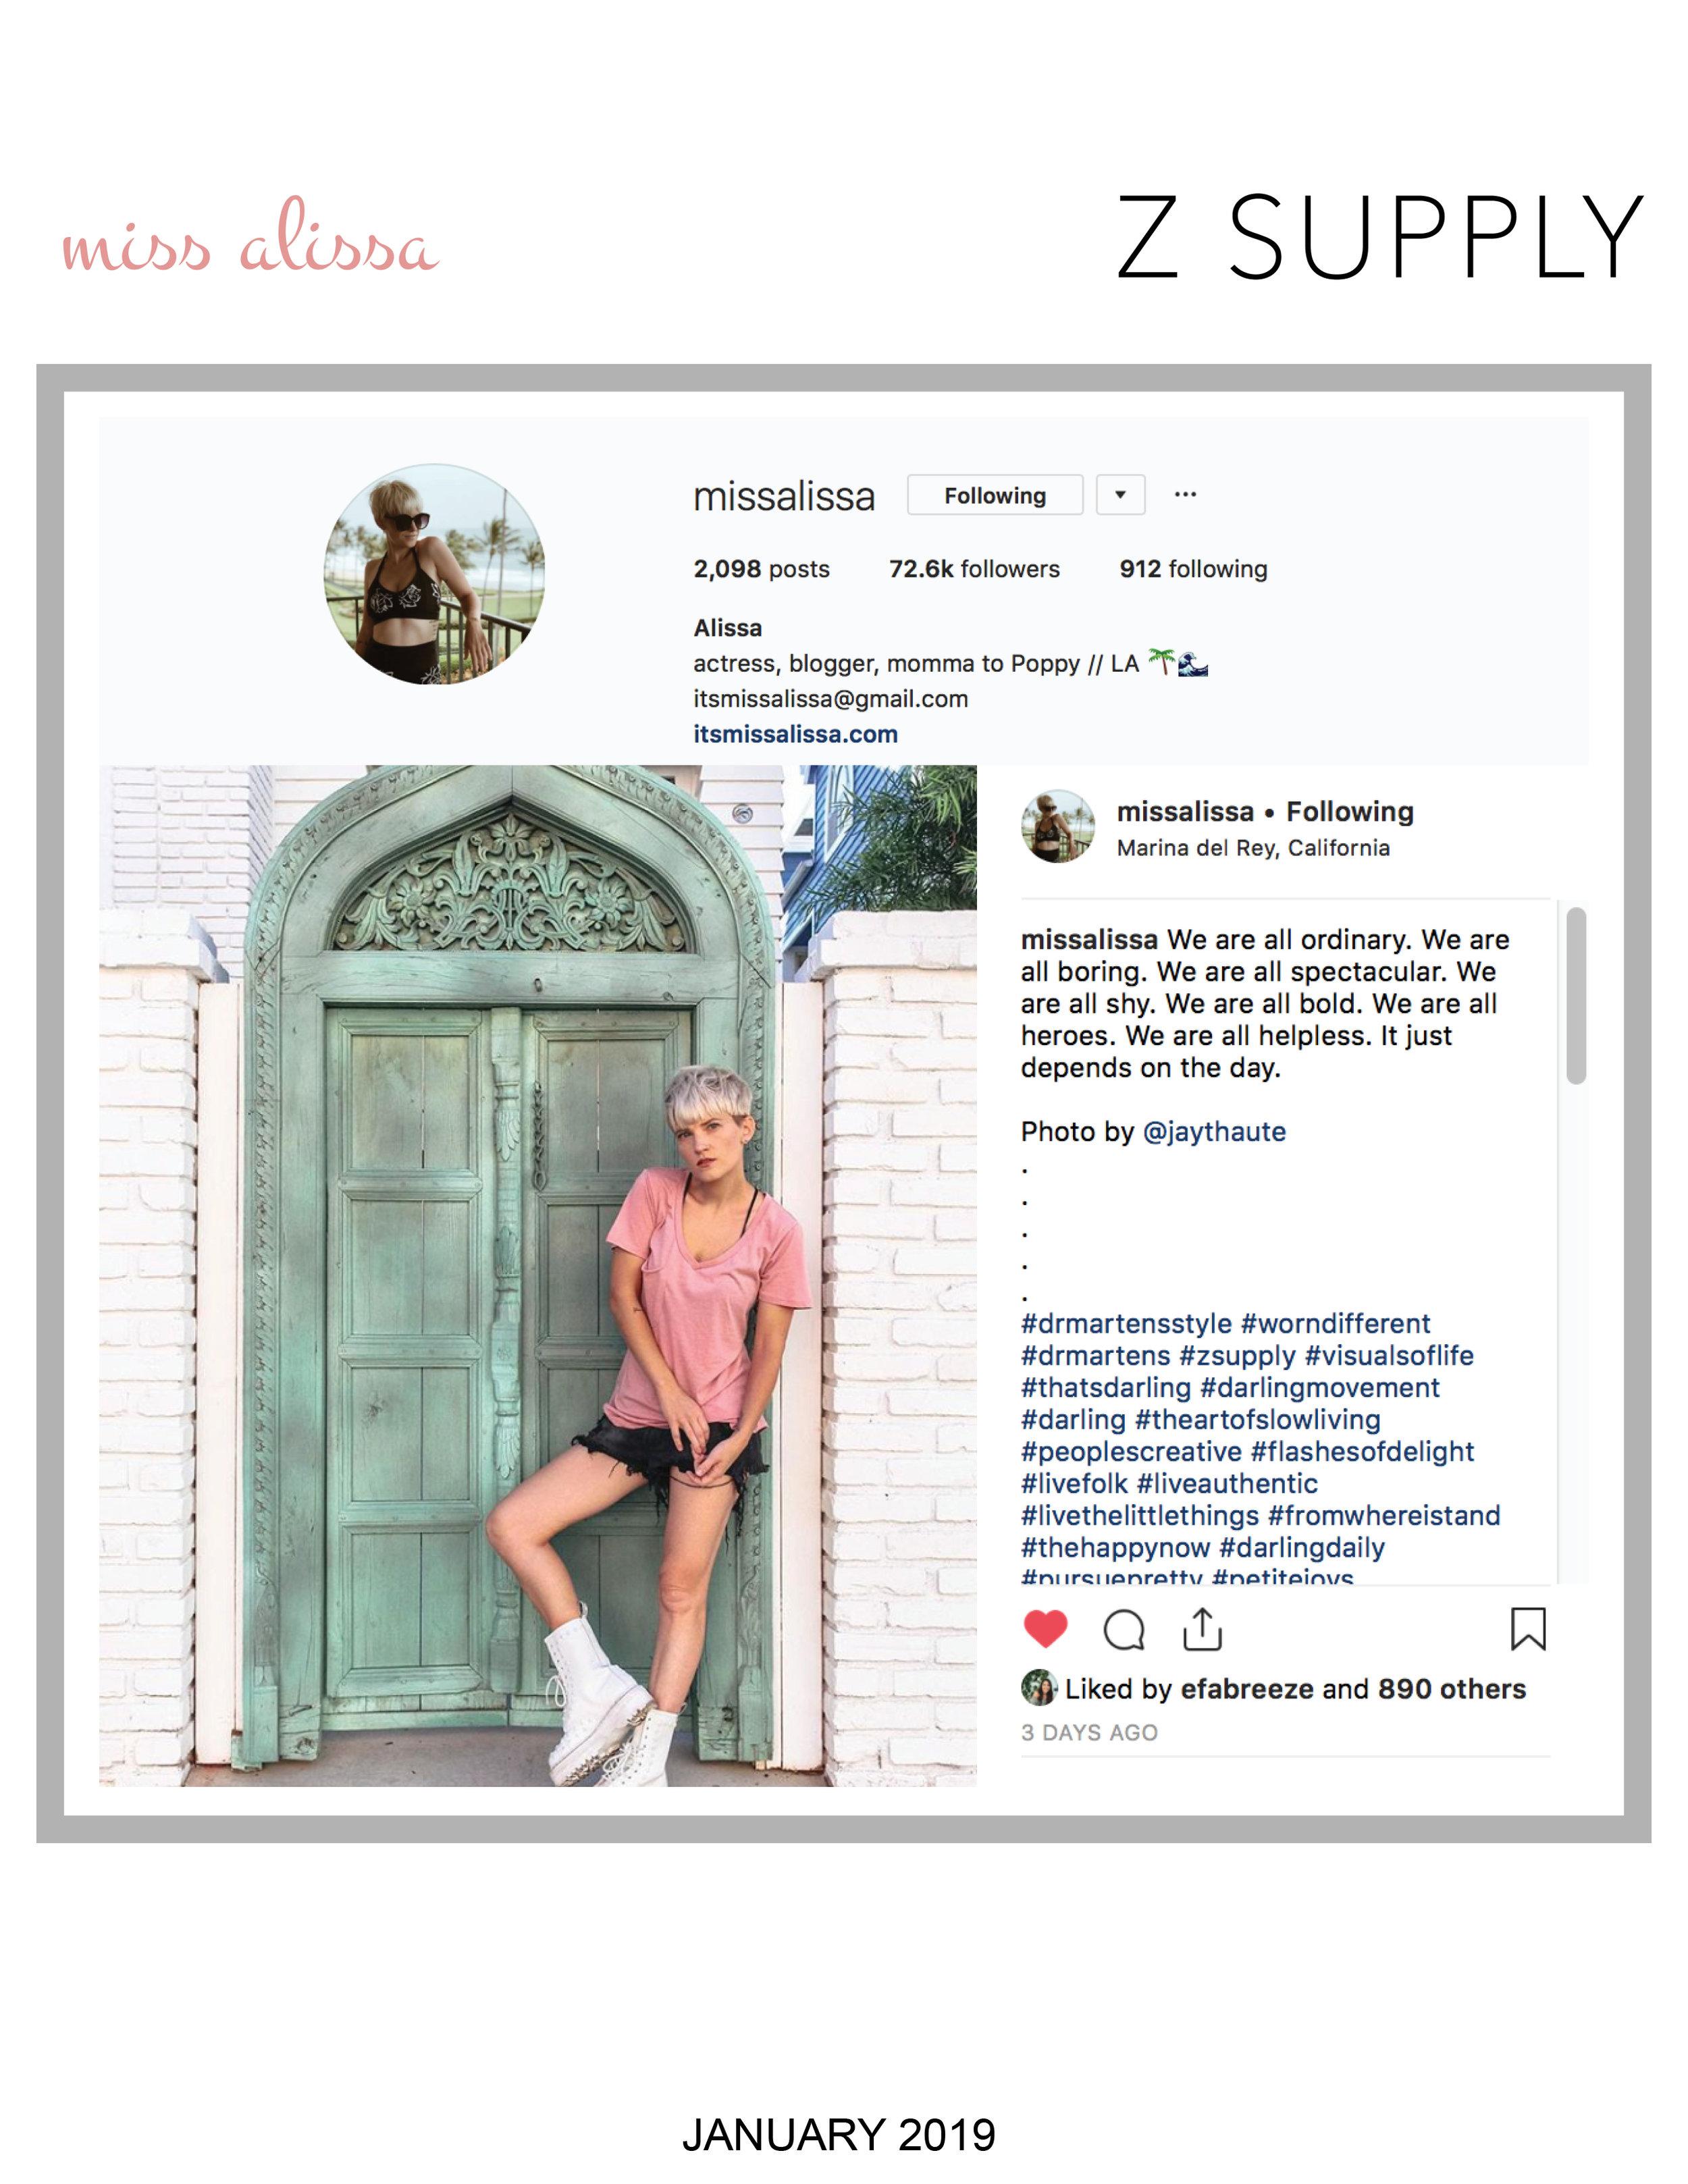 Zsupply_MissAlissa_January2019.jpg